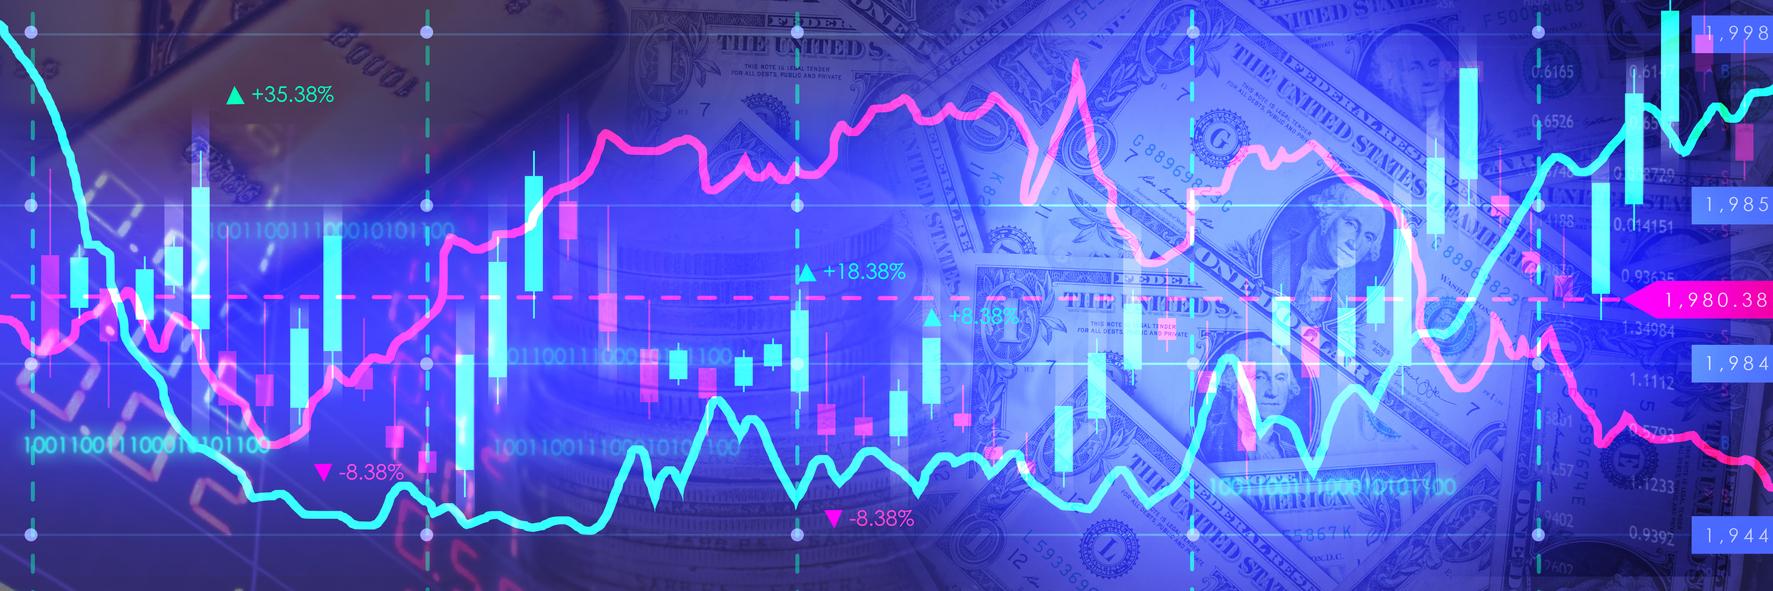 a digital financial graph